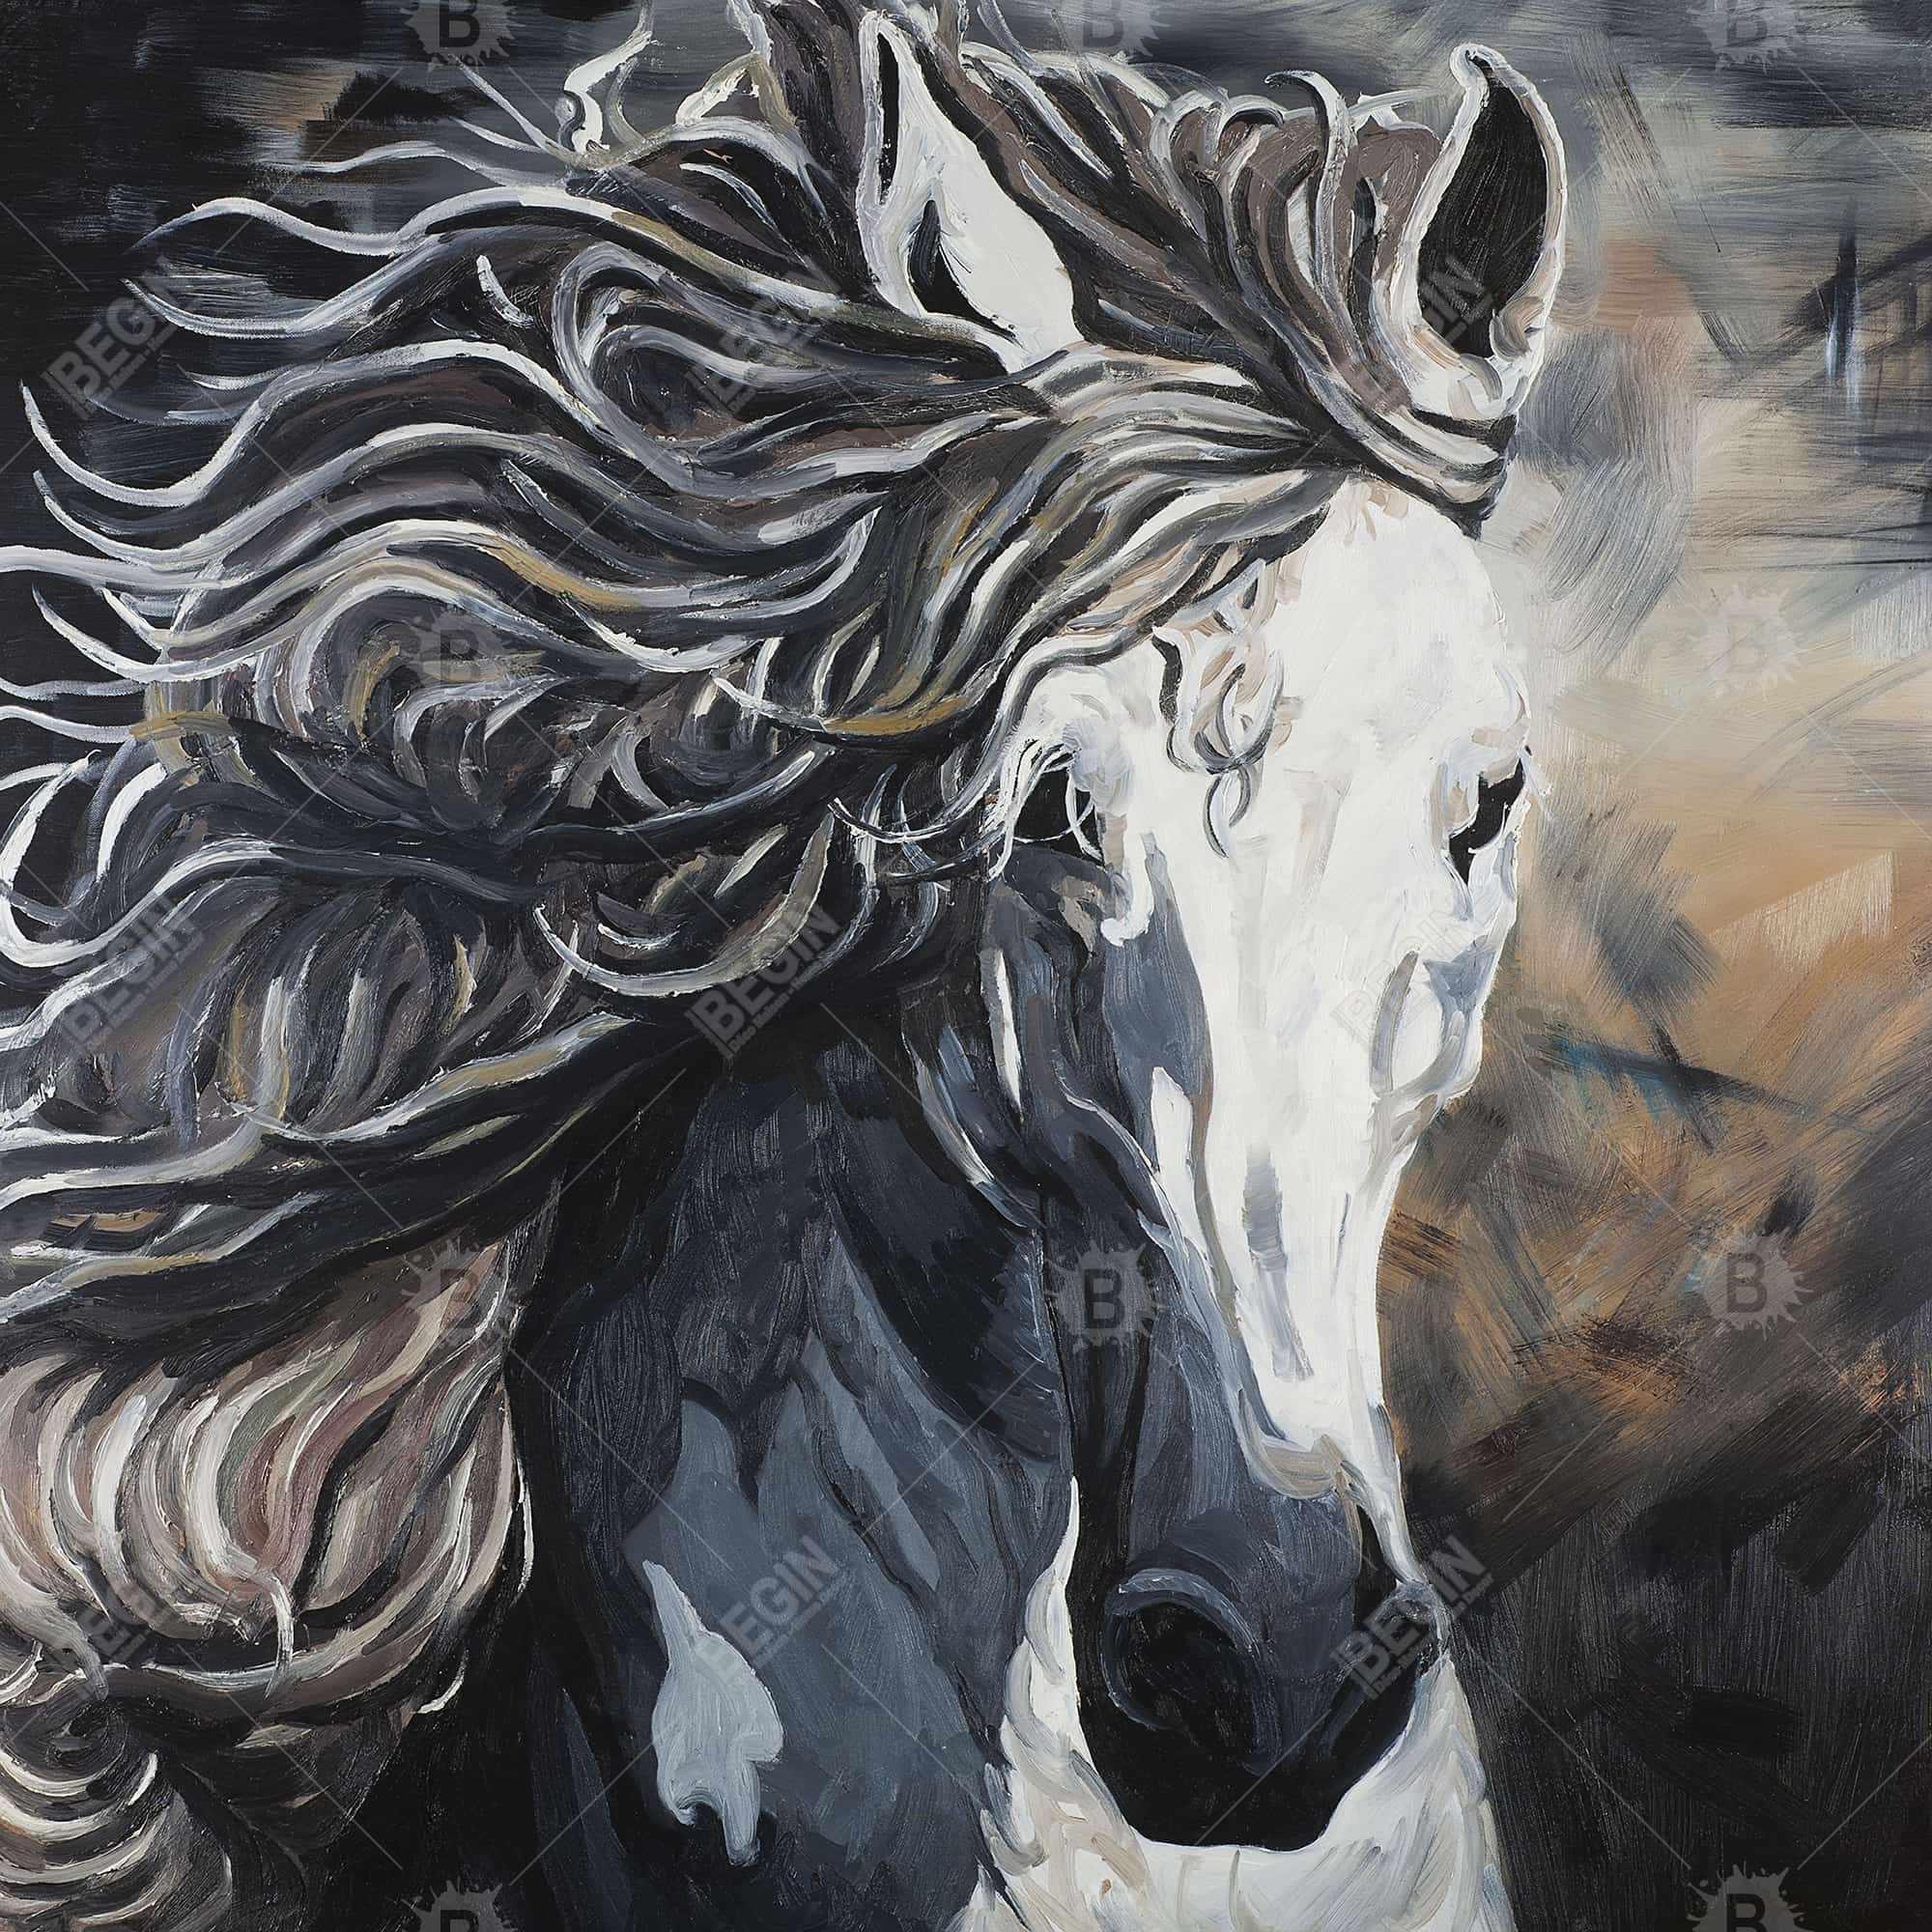 Rabid Horse Artwork Home Facebook - 1000×1000